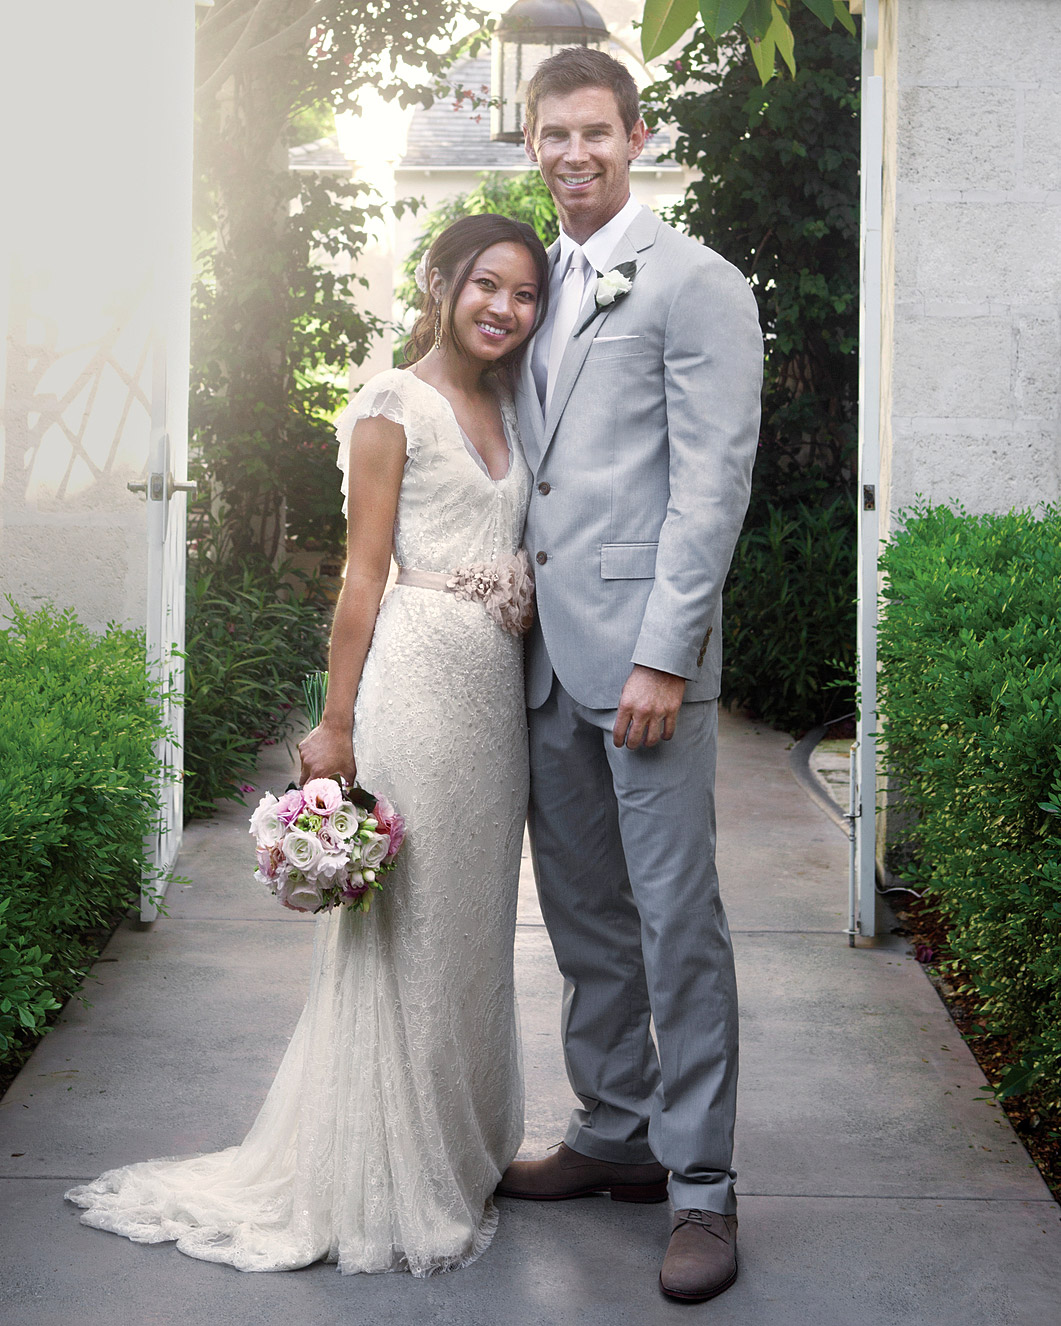 rw-anne-josh-bride-groom-2-mwd106057.jpg